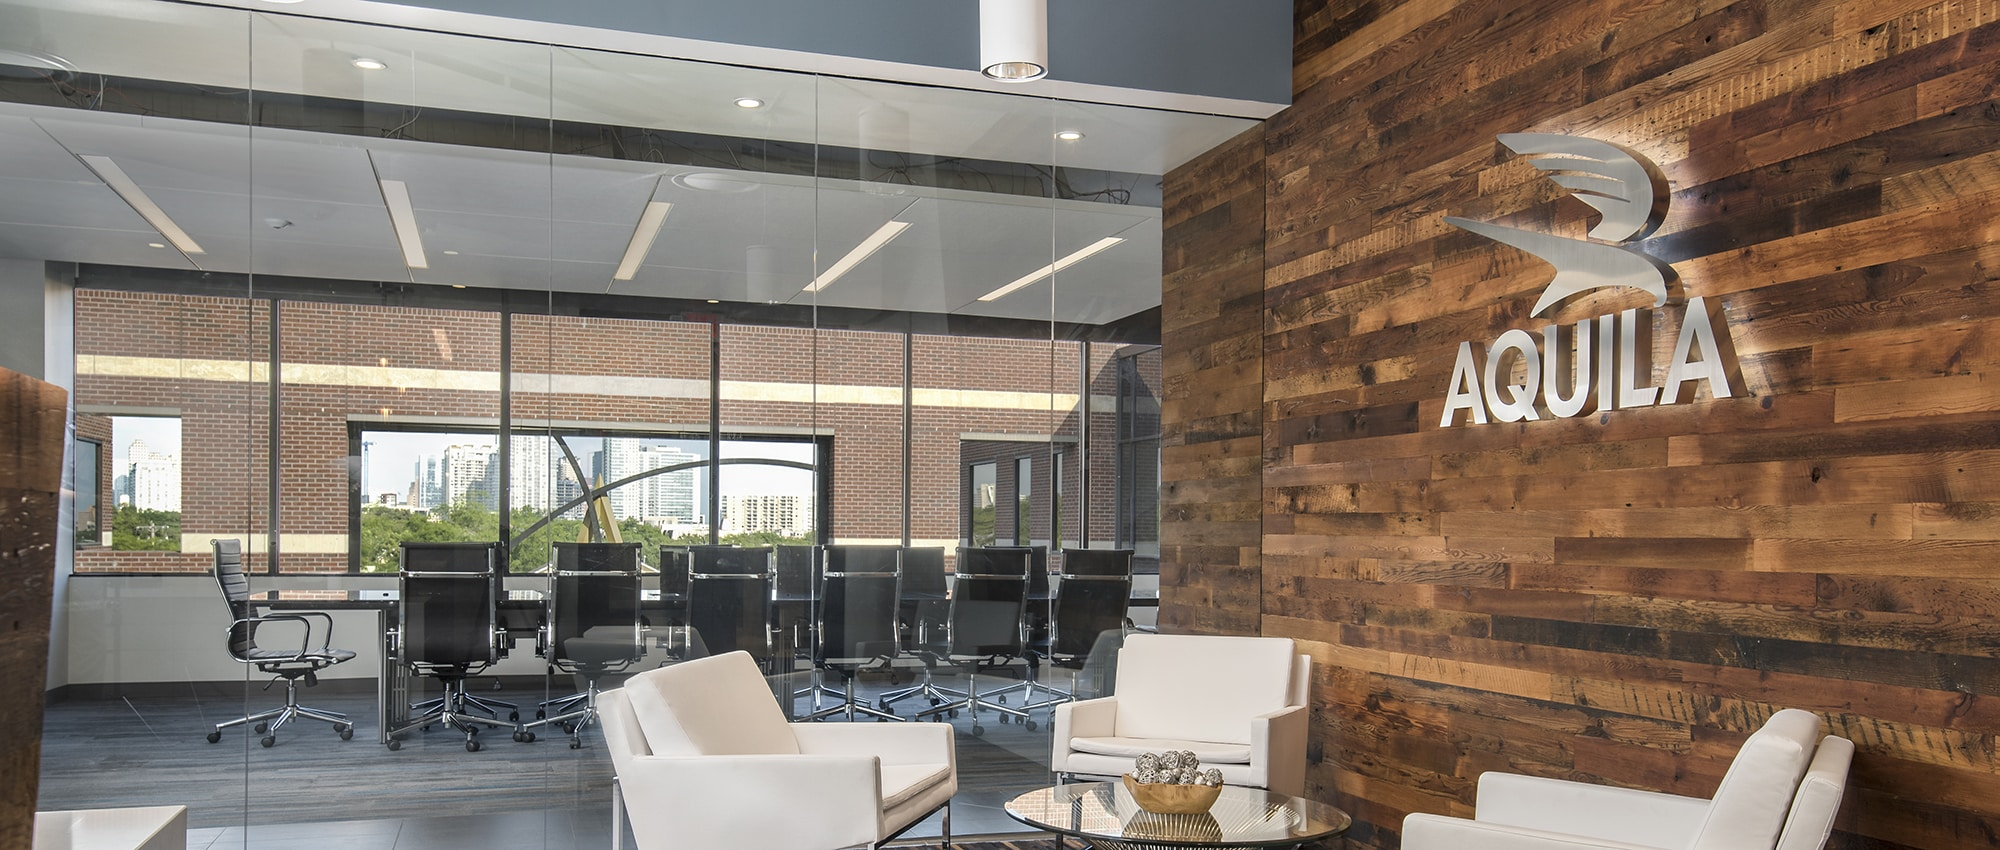 Best Tenant Rep Firms Austin | AQUILA Offices